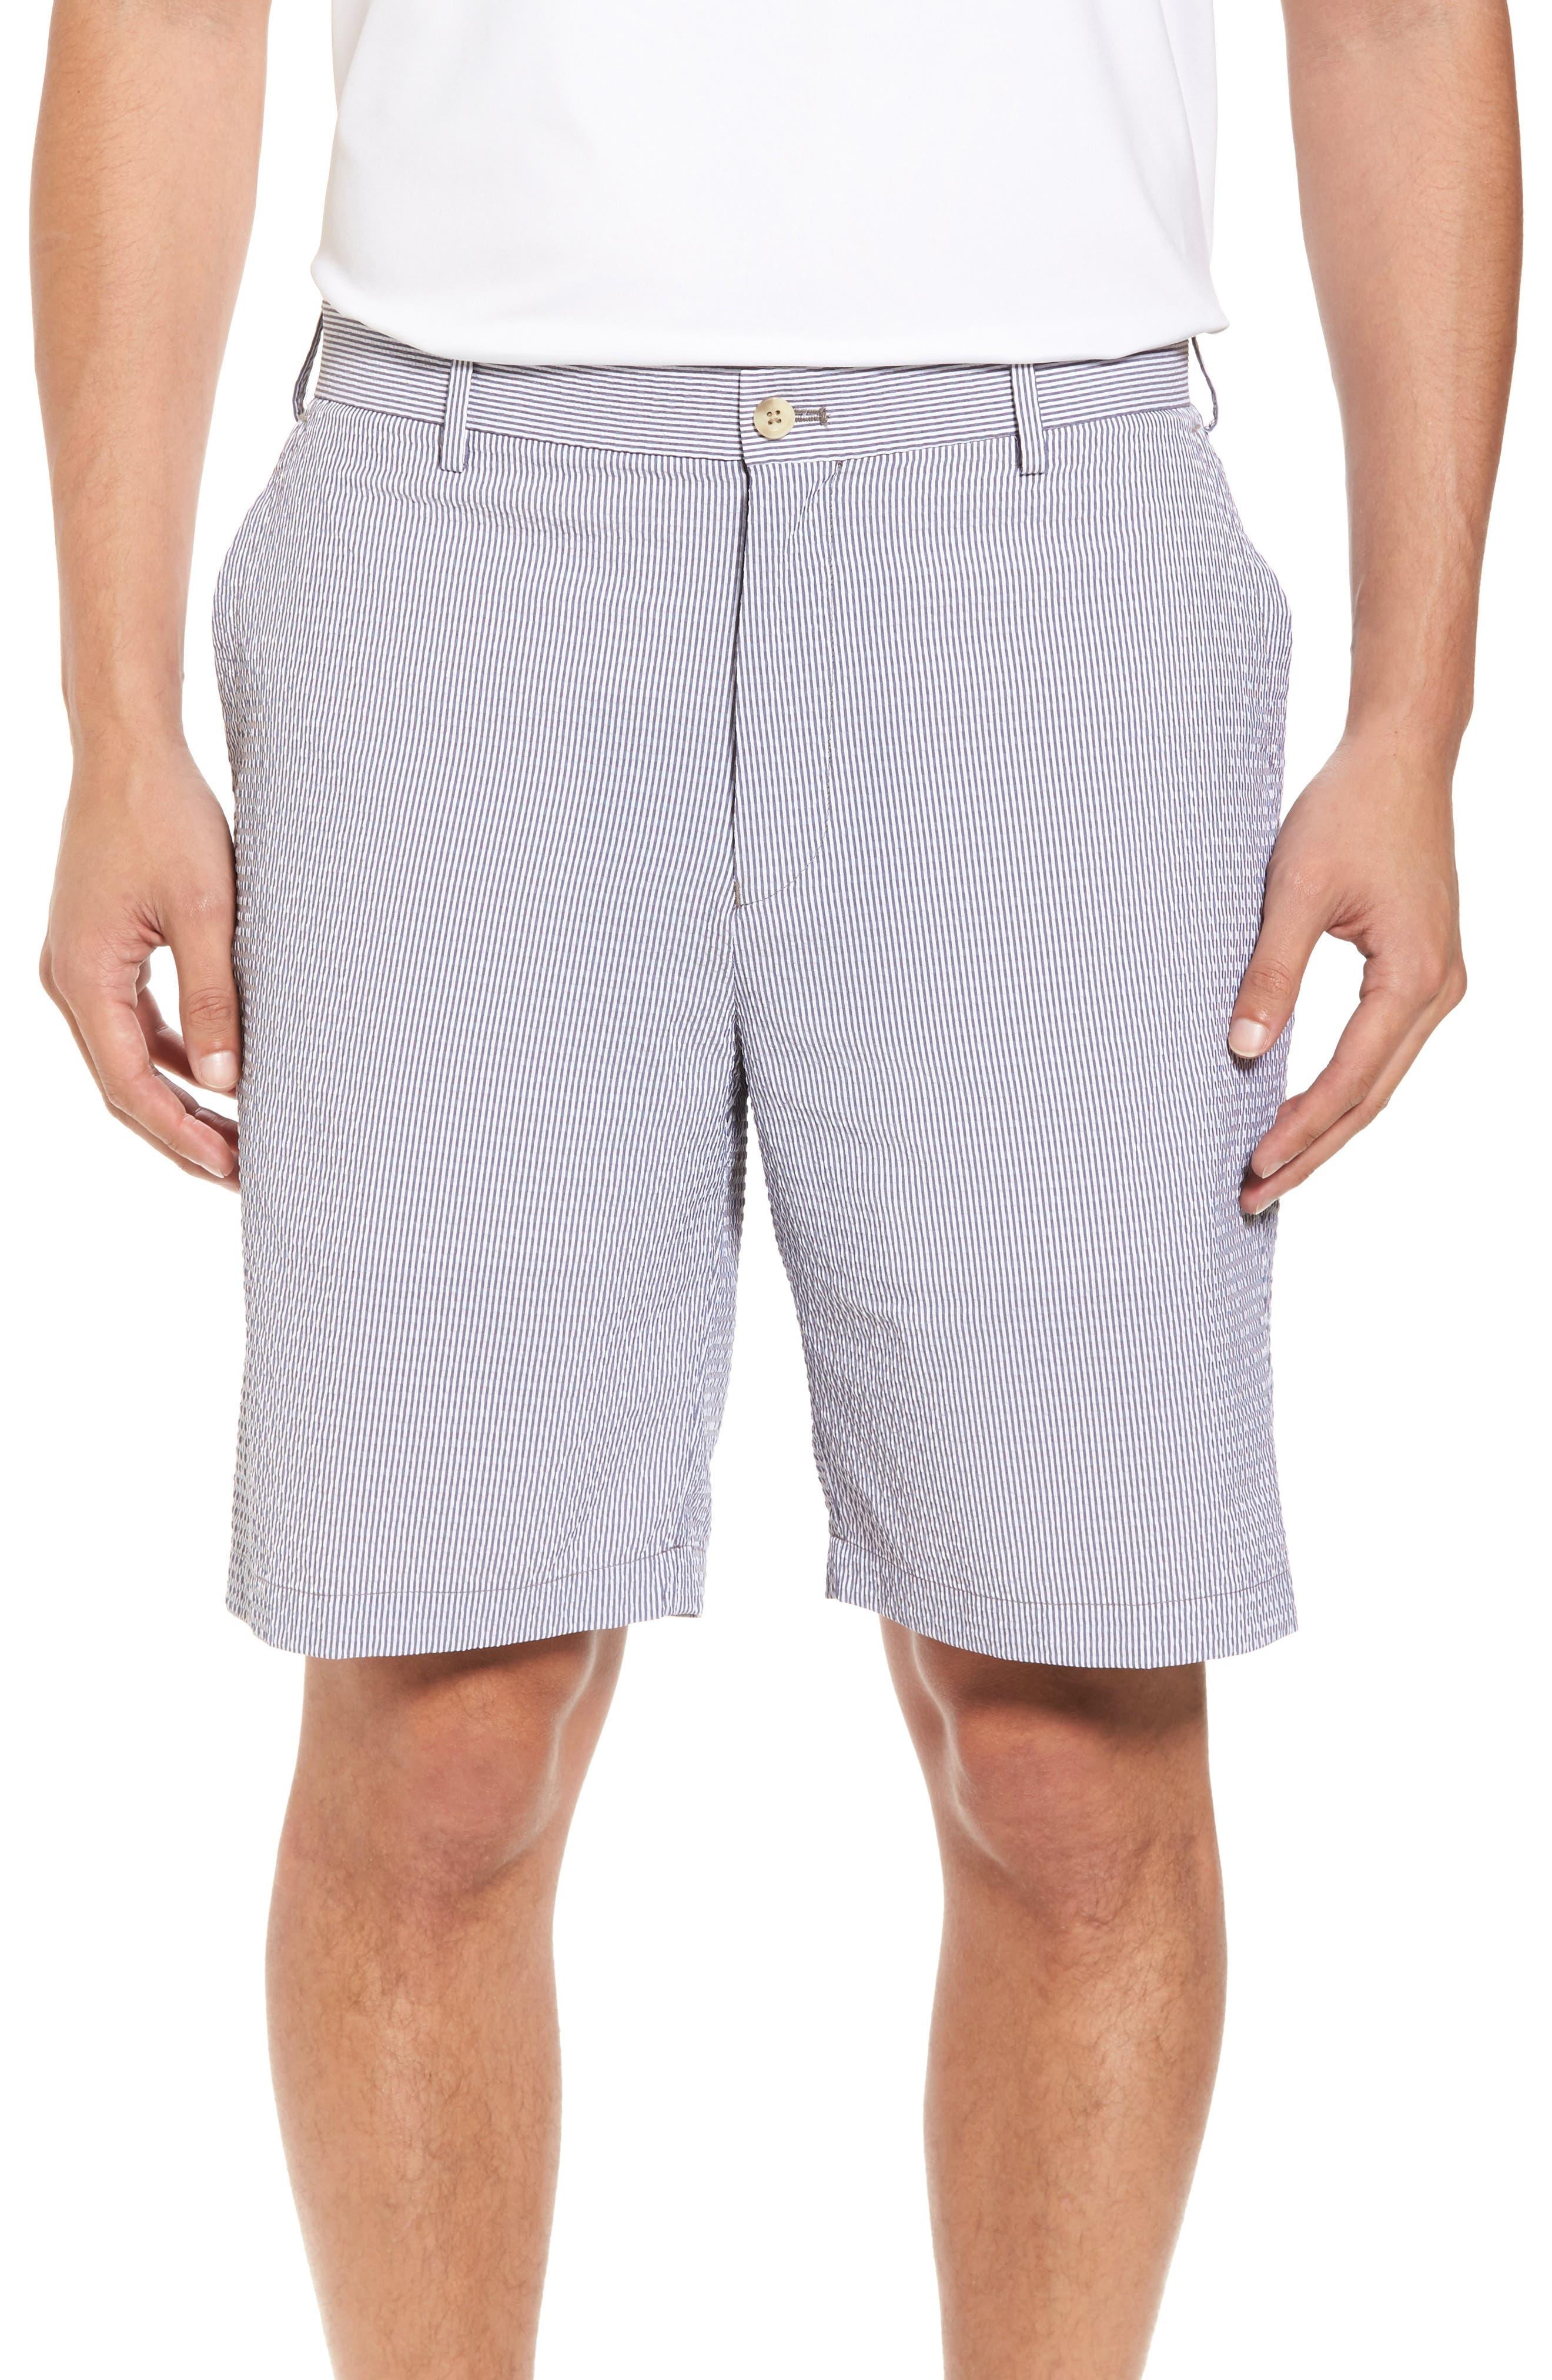 Peter Millar Apex Pinstripe Seersucker Shorts